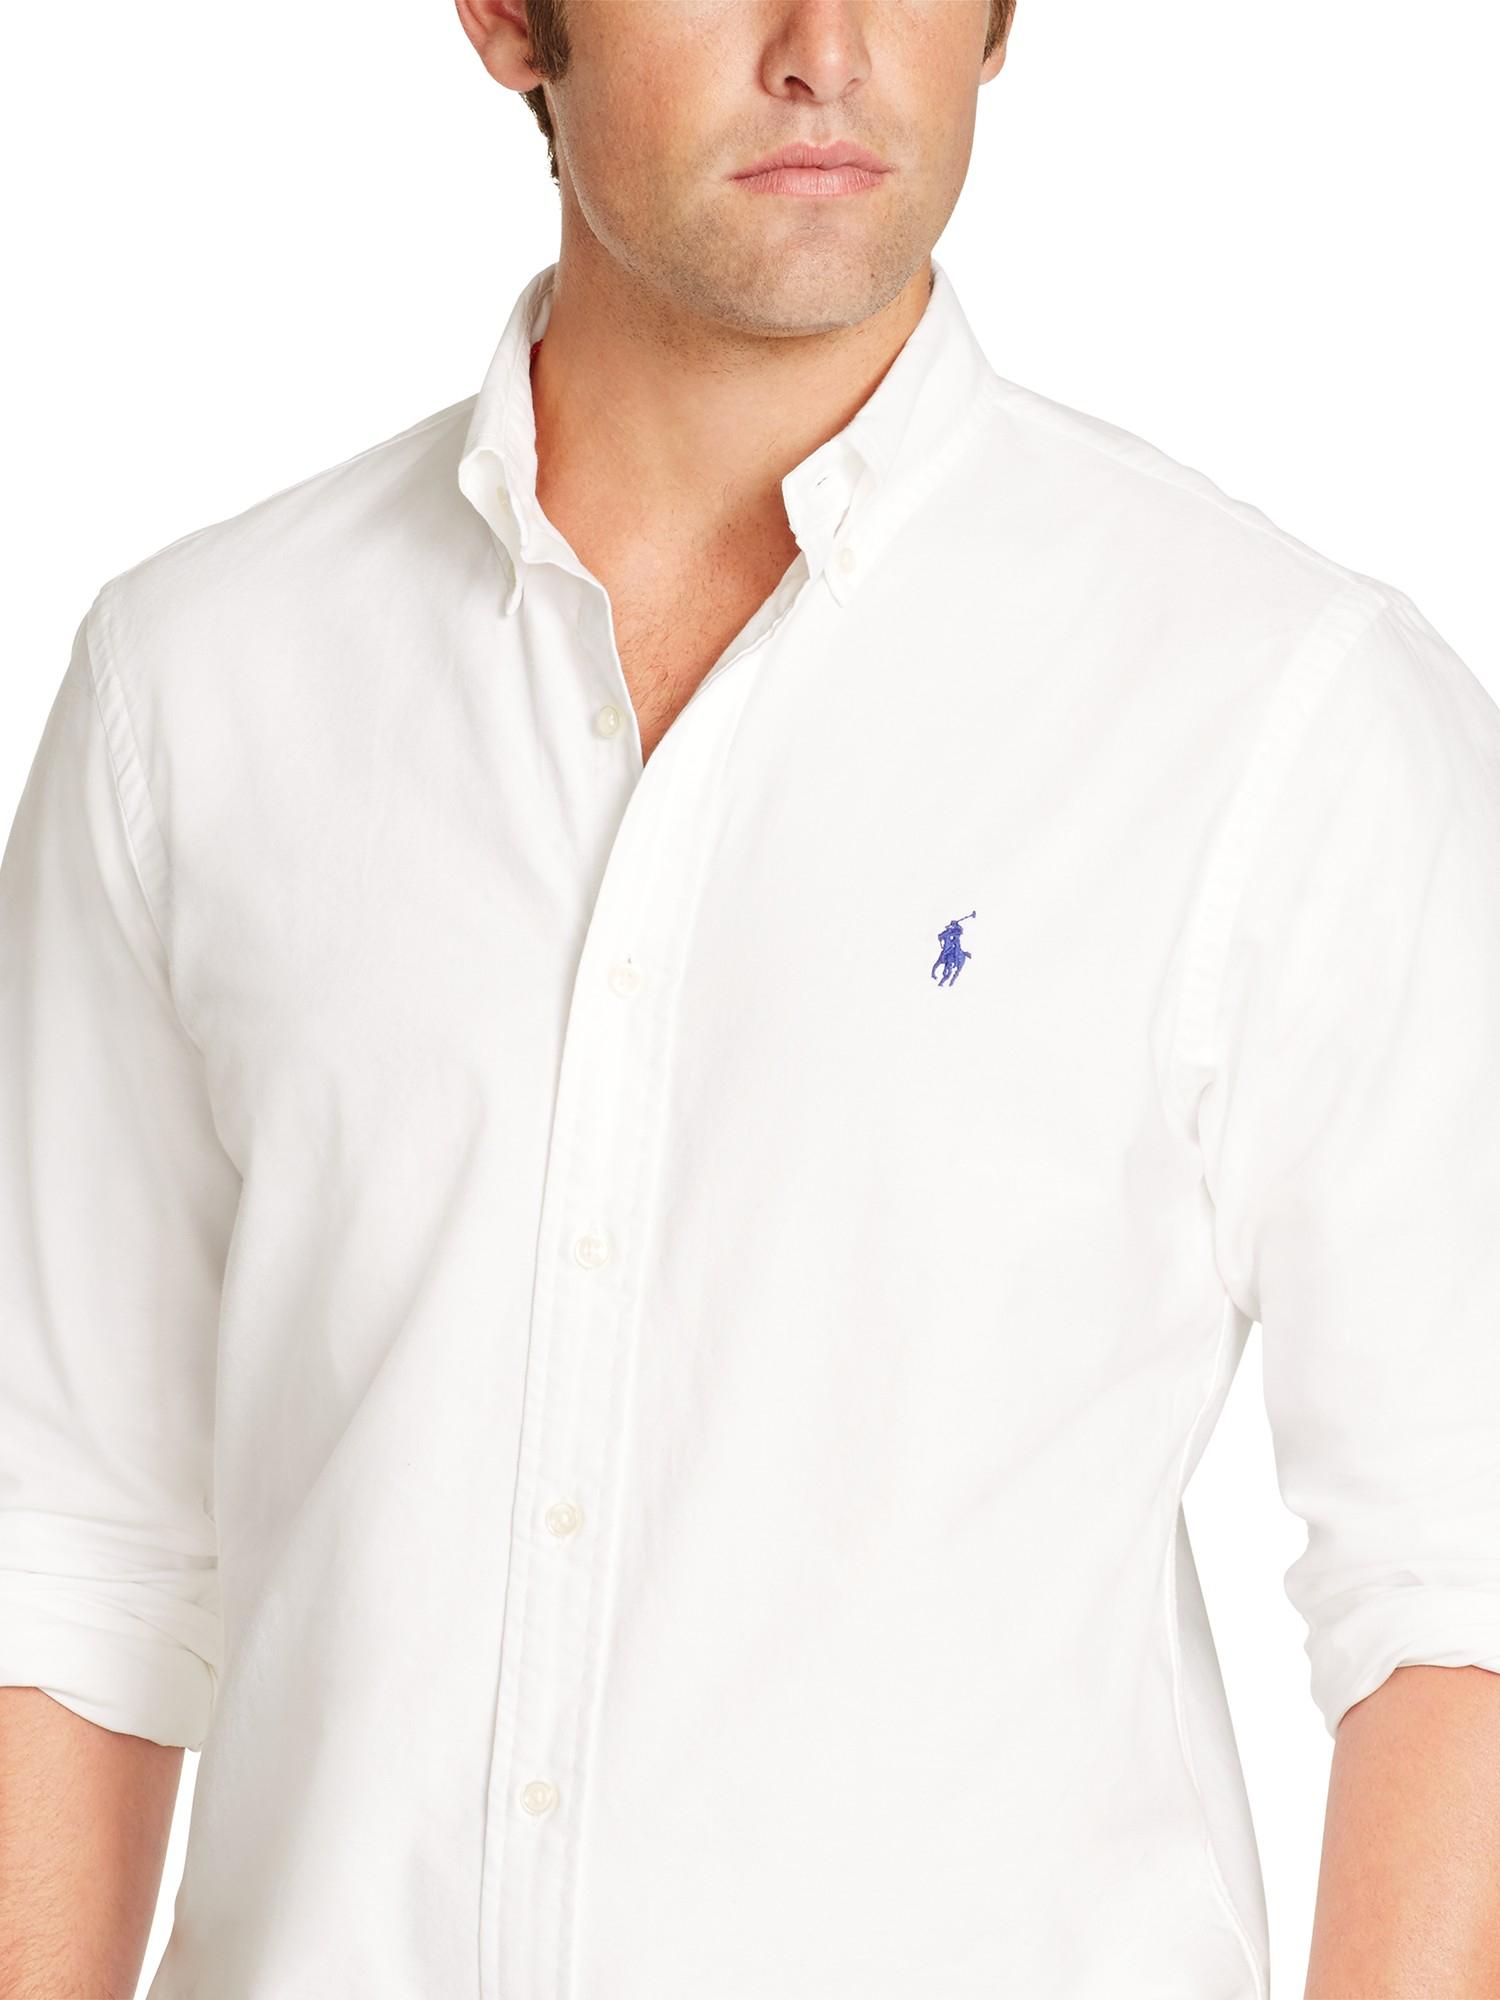 fec9e5975fc2f Polo Ralph Lauren Slim Fit Oxford Shirt in White for Men - Lyst